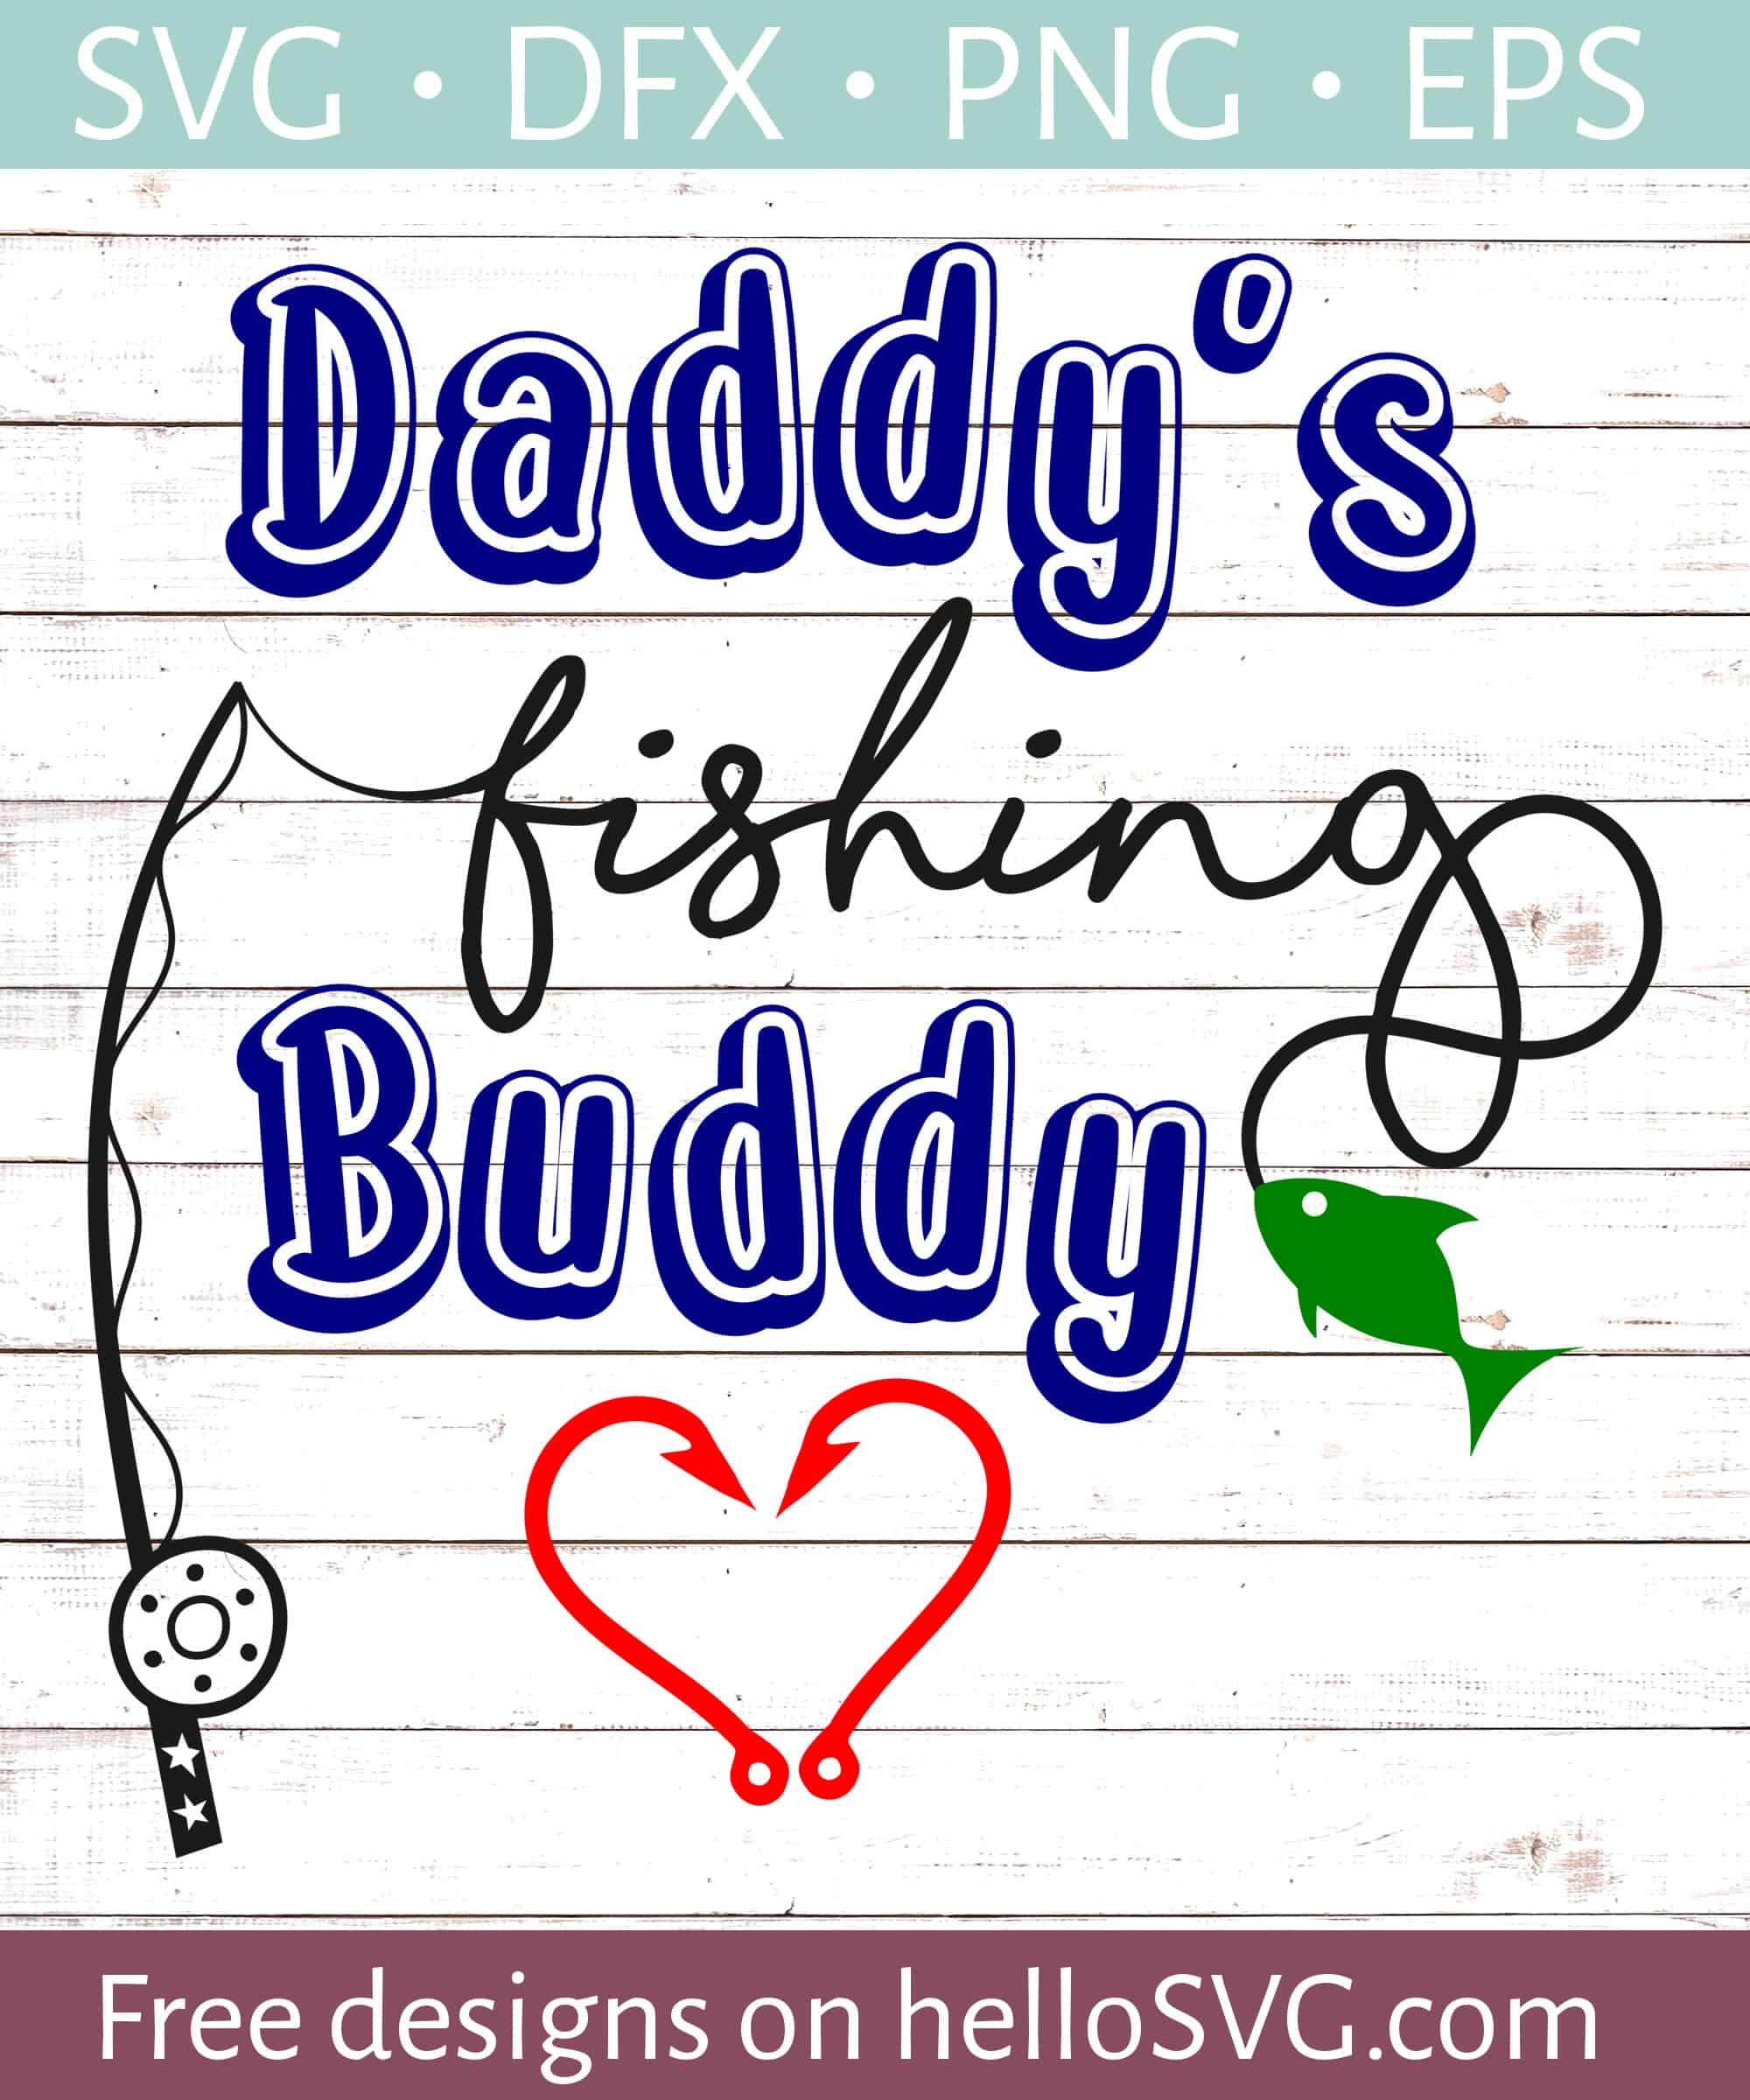 ec79f6aab Daddy's Fishing Buddy #2 SVG - Free SVG files | HelloSVG.com